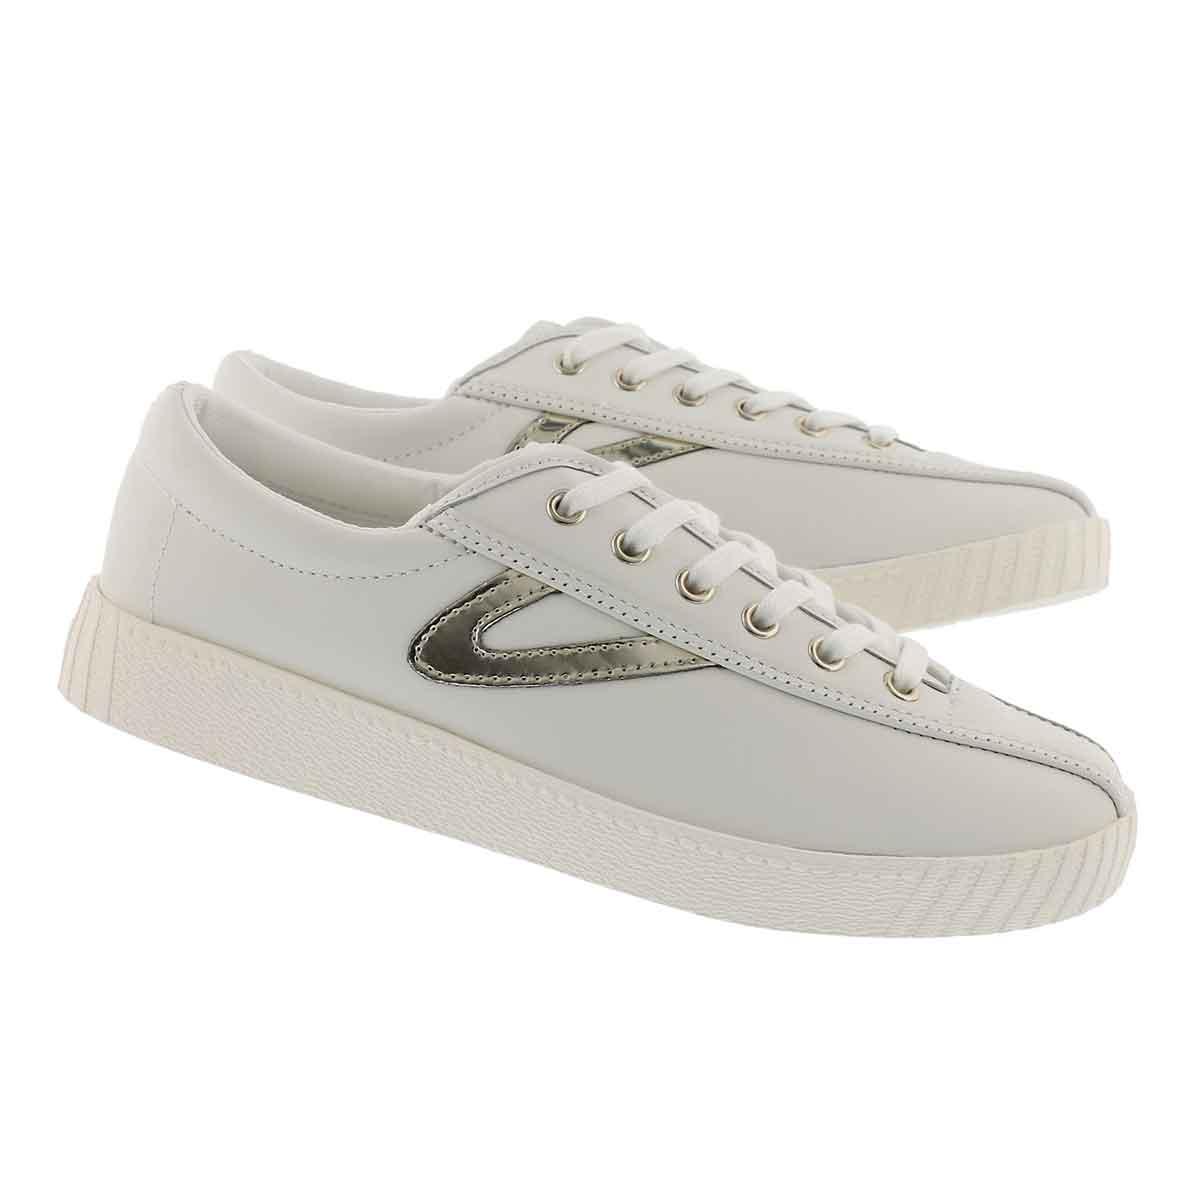 Lds Nylite 2 Plus white/gold sneaker